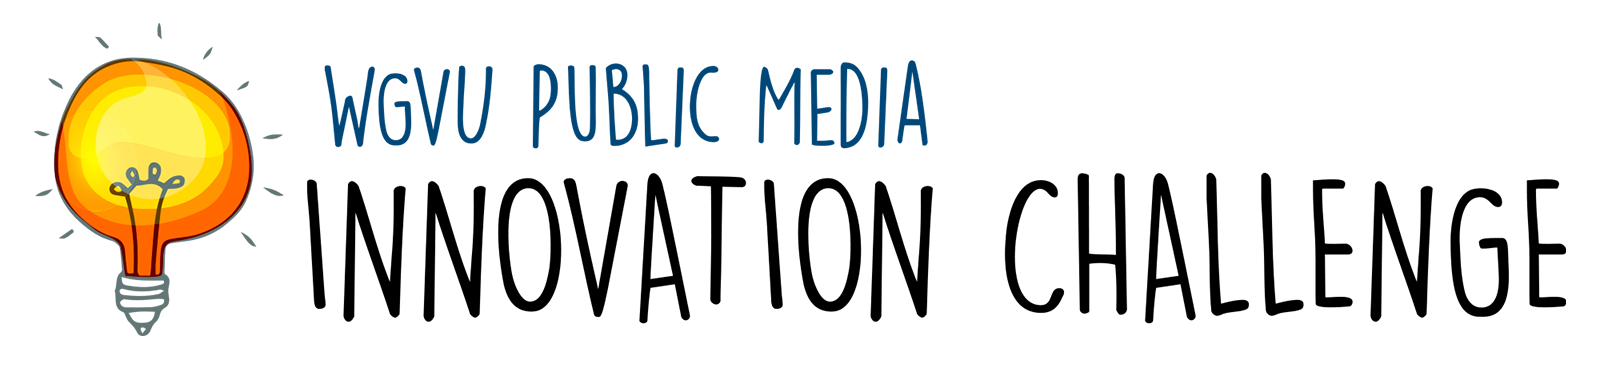 WGVU Public Media Innovation Challenge